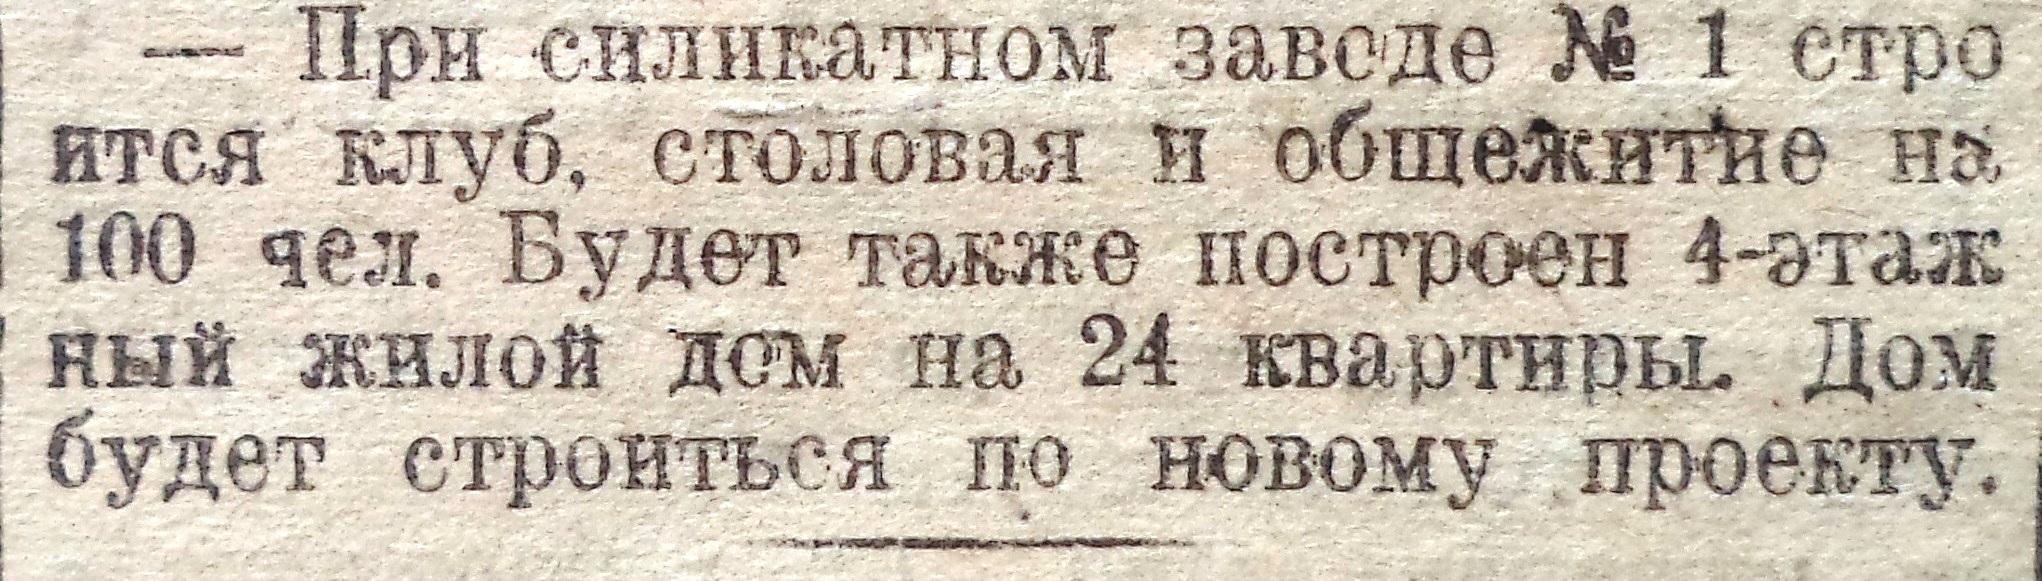 Соколова-ФОТО-13-РабСам-1932-09-14-о доставке кирпича